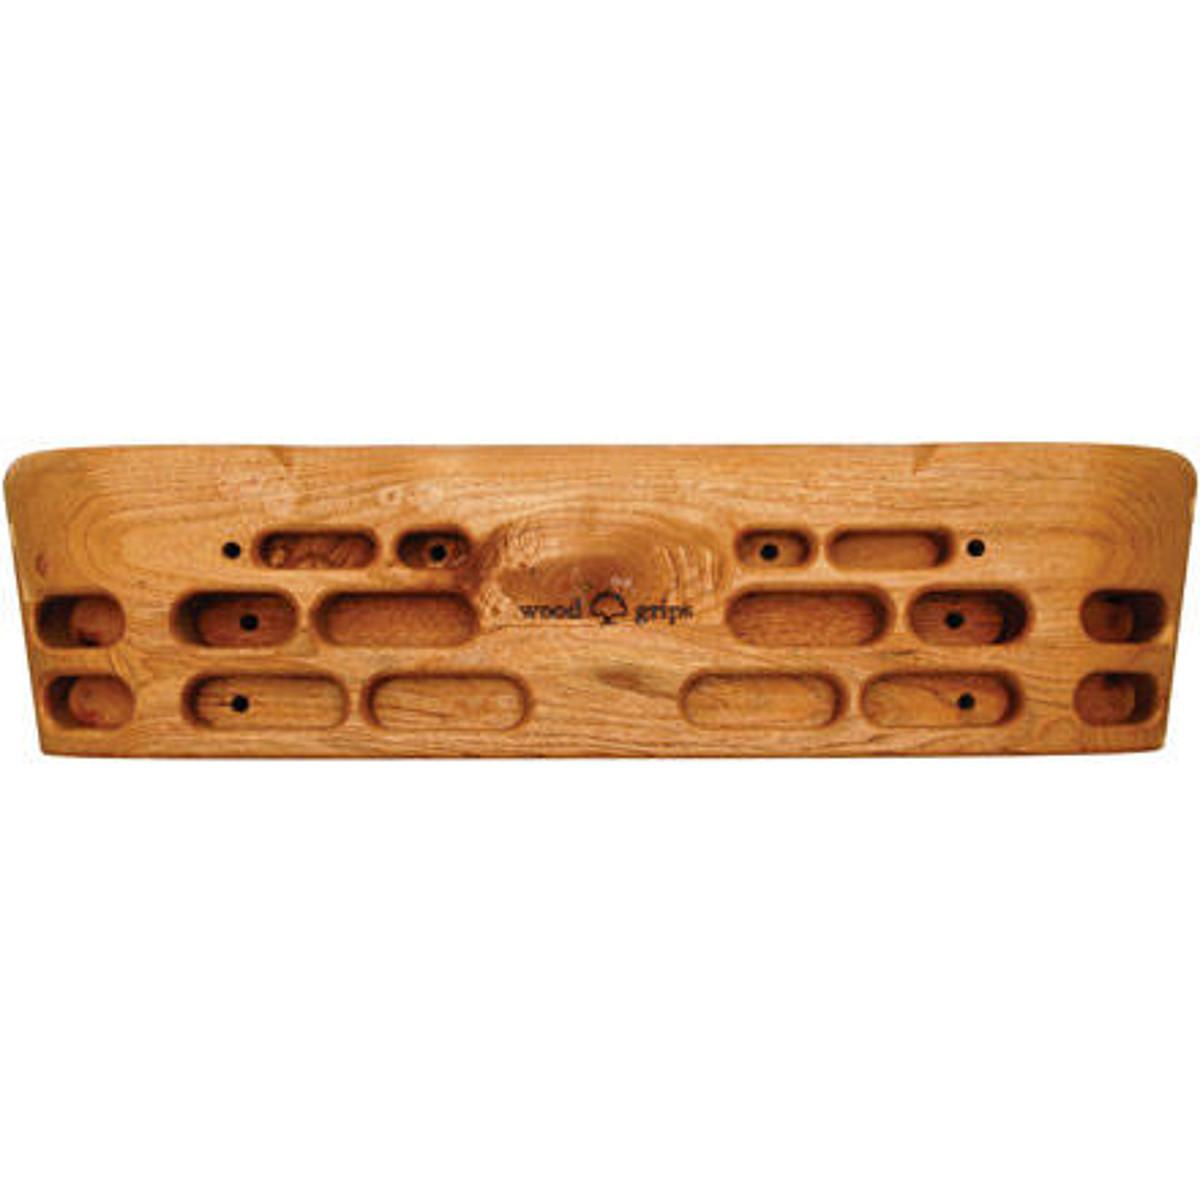 Metolius Wood Grips Deluxe Training Board